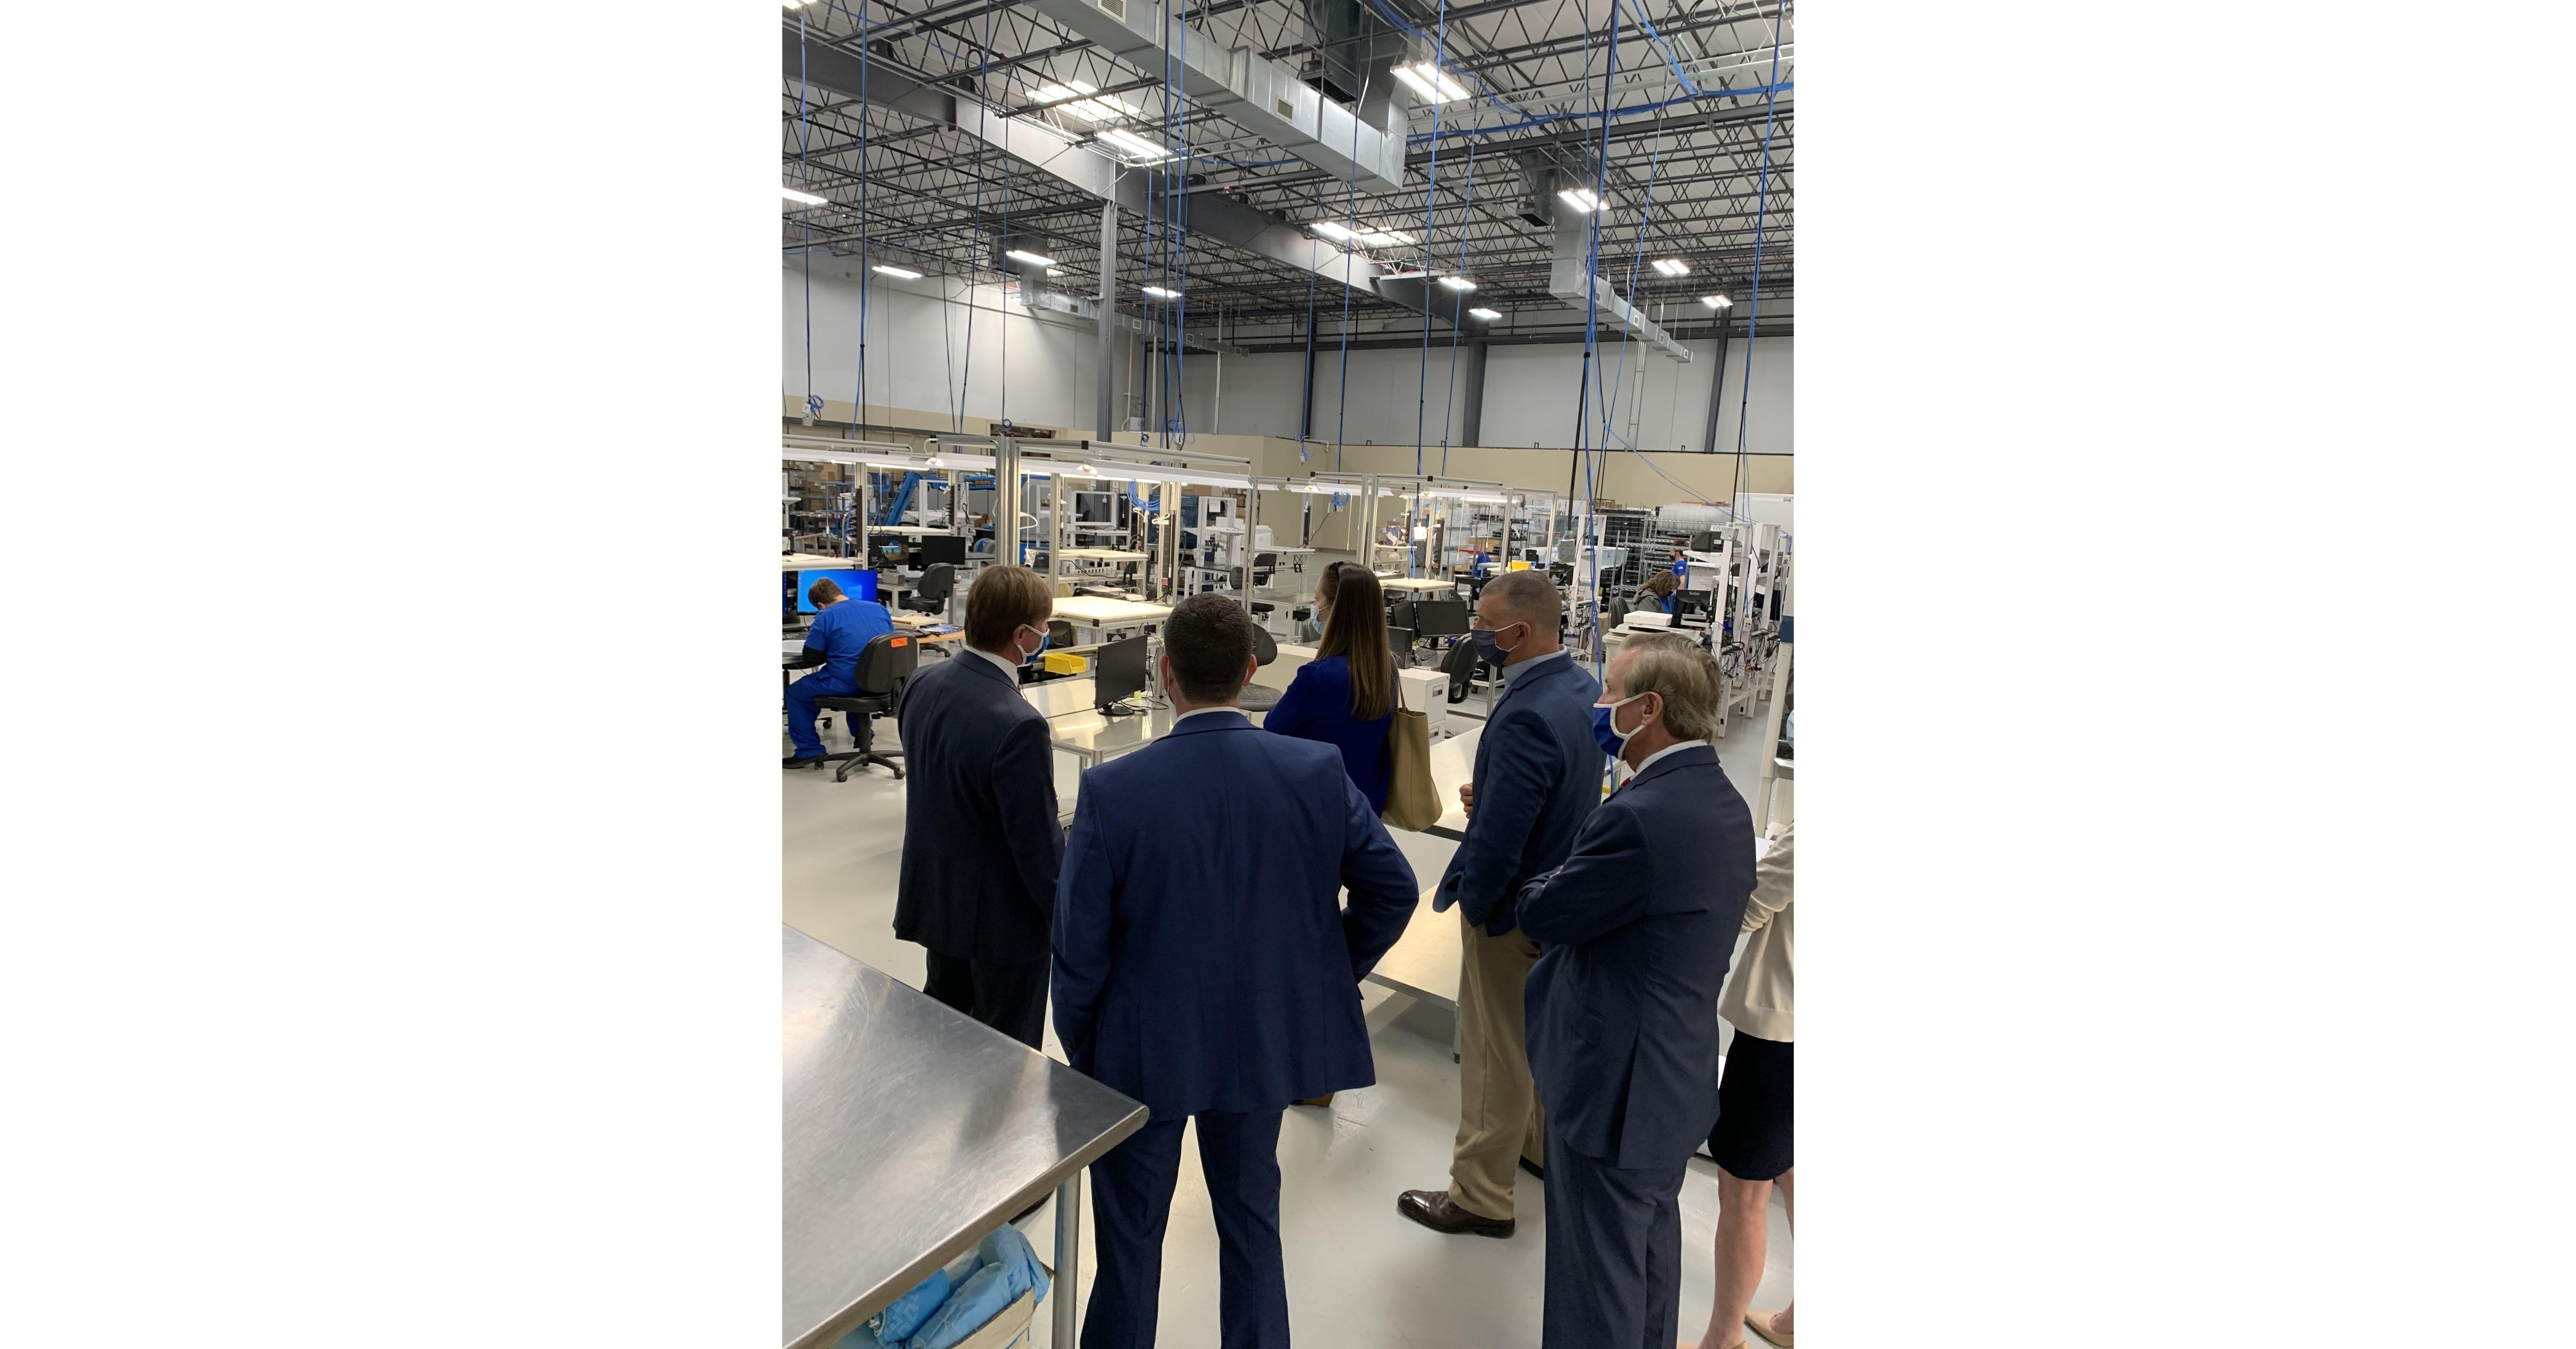 Senator Tim Scotts Senior Staff Visits SCs First COVID-19 Testing Lab at One Year Mark